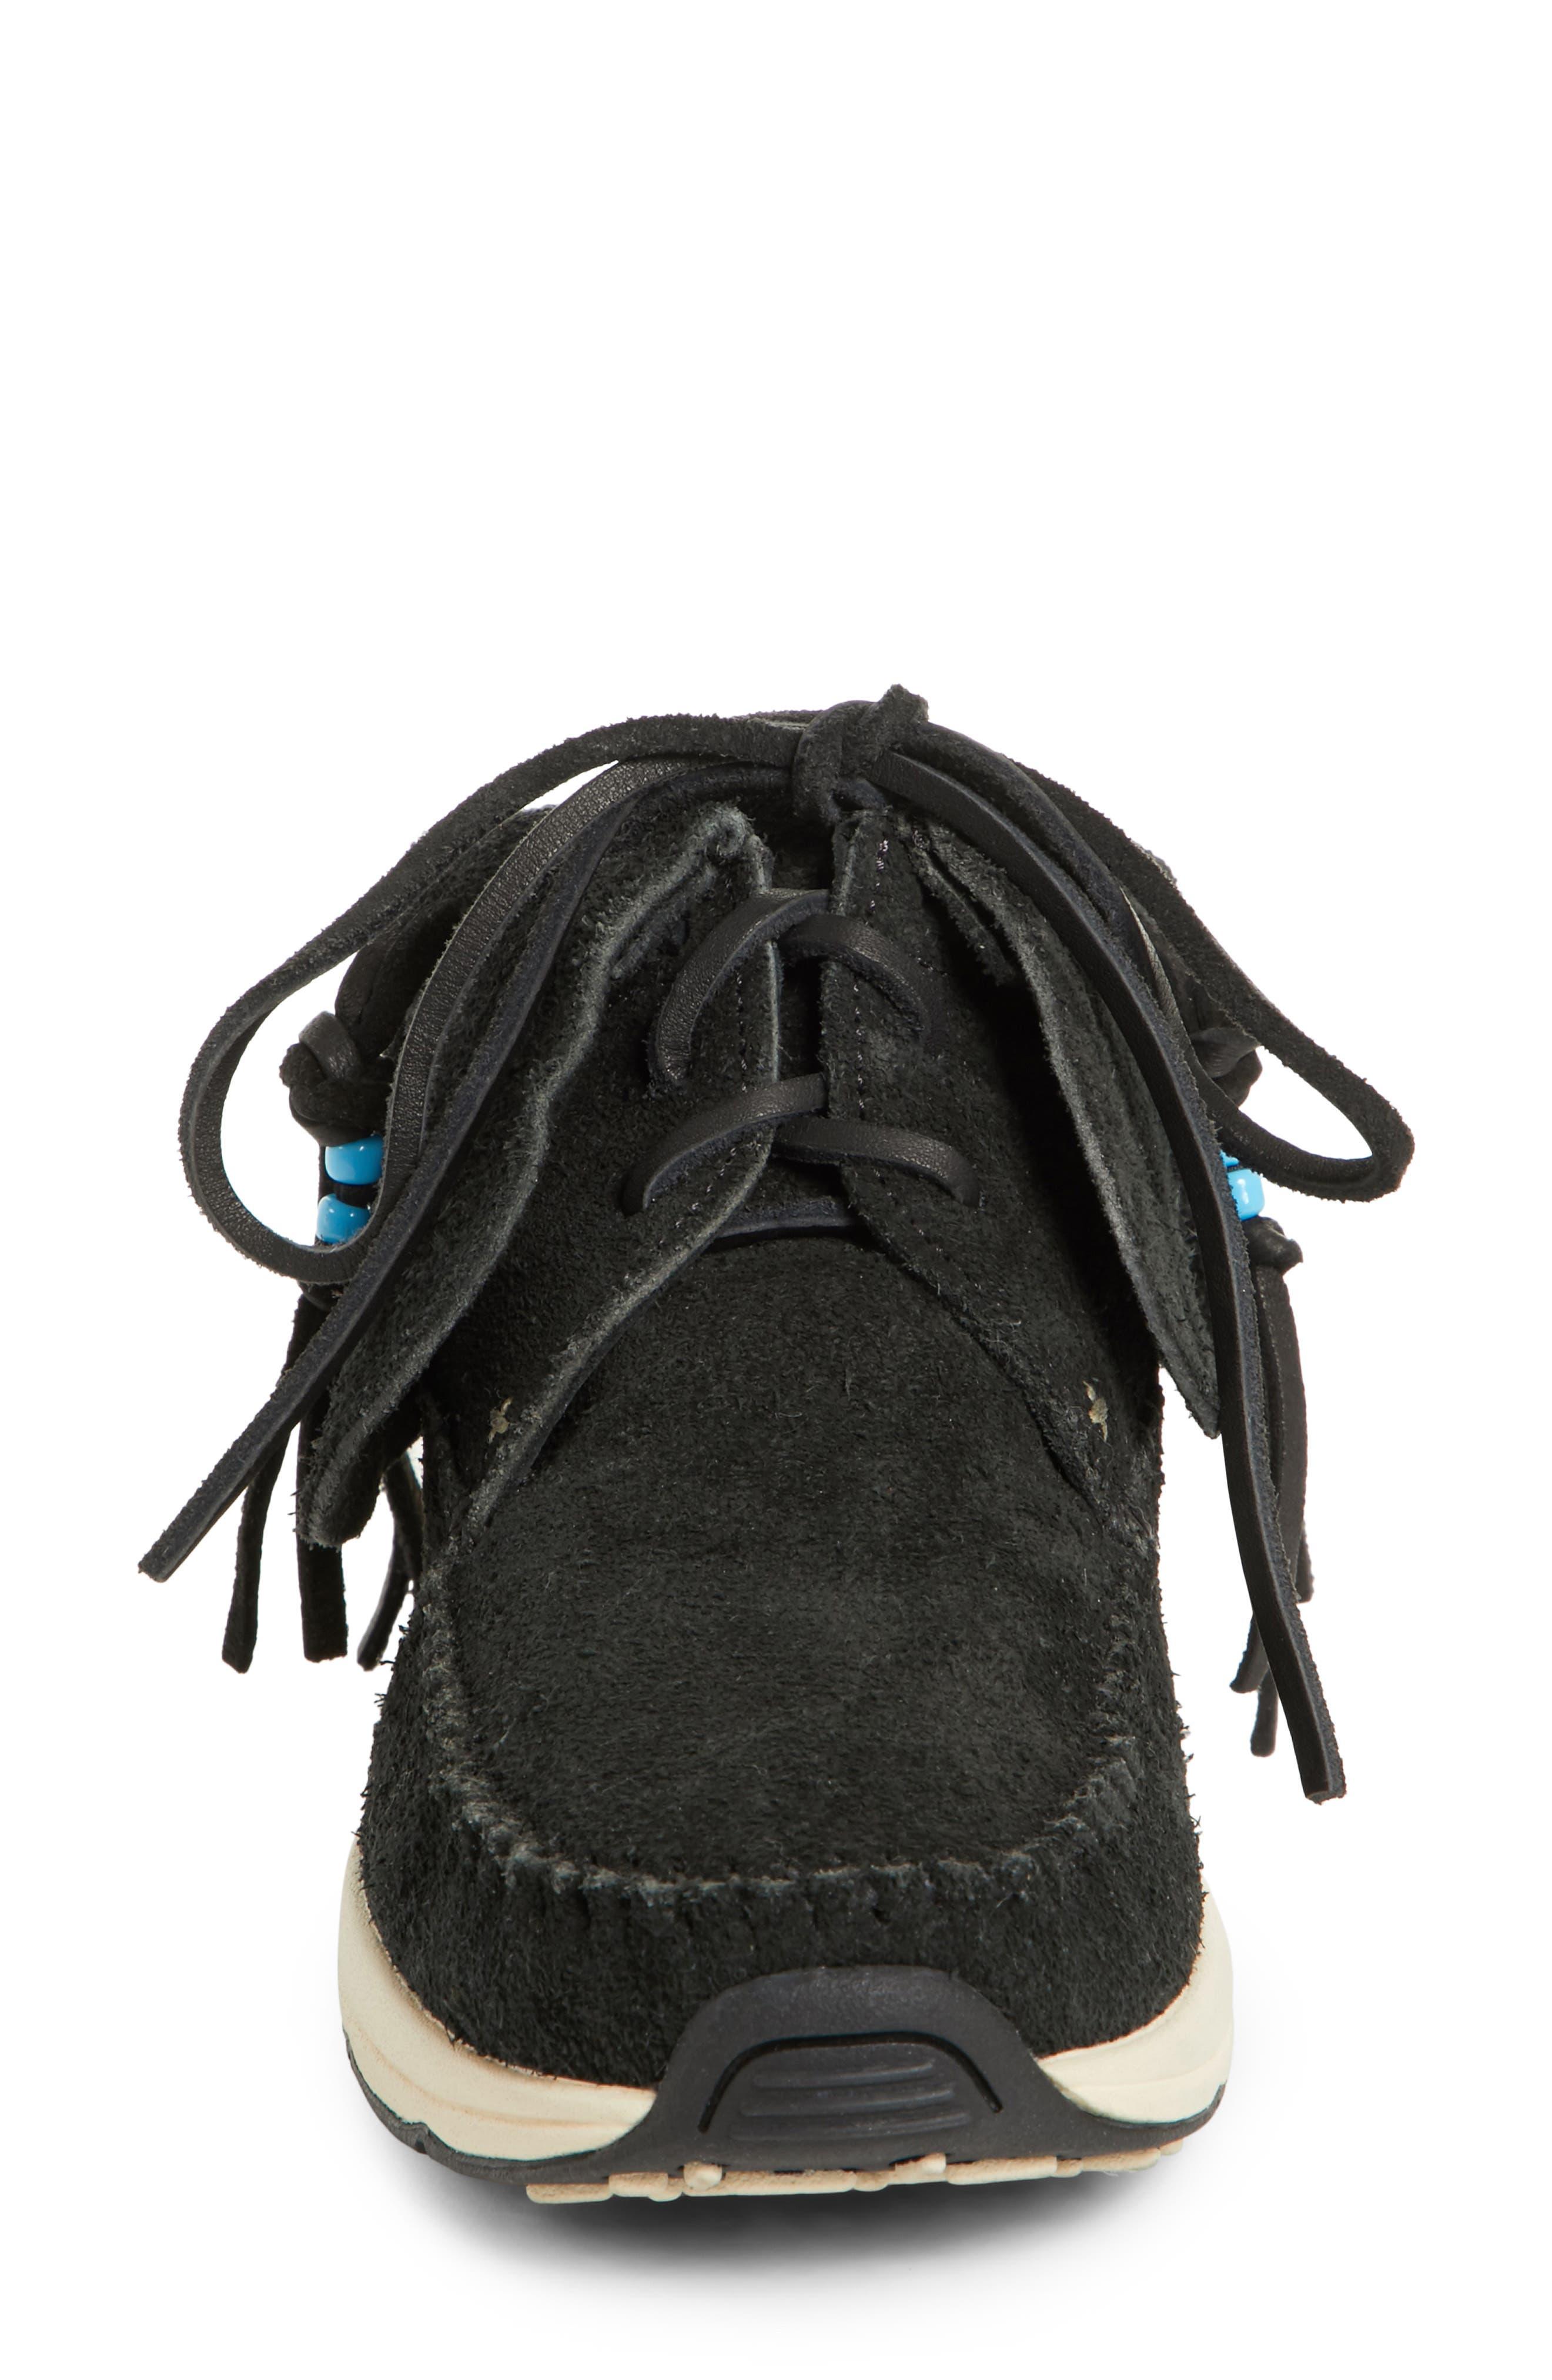 FBT Suede Moccasin Sneaker,                             Alternate thumbnail 4, color,                             003